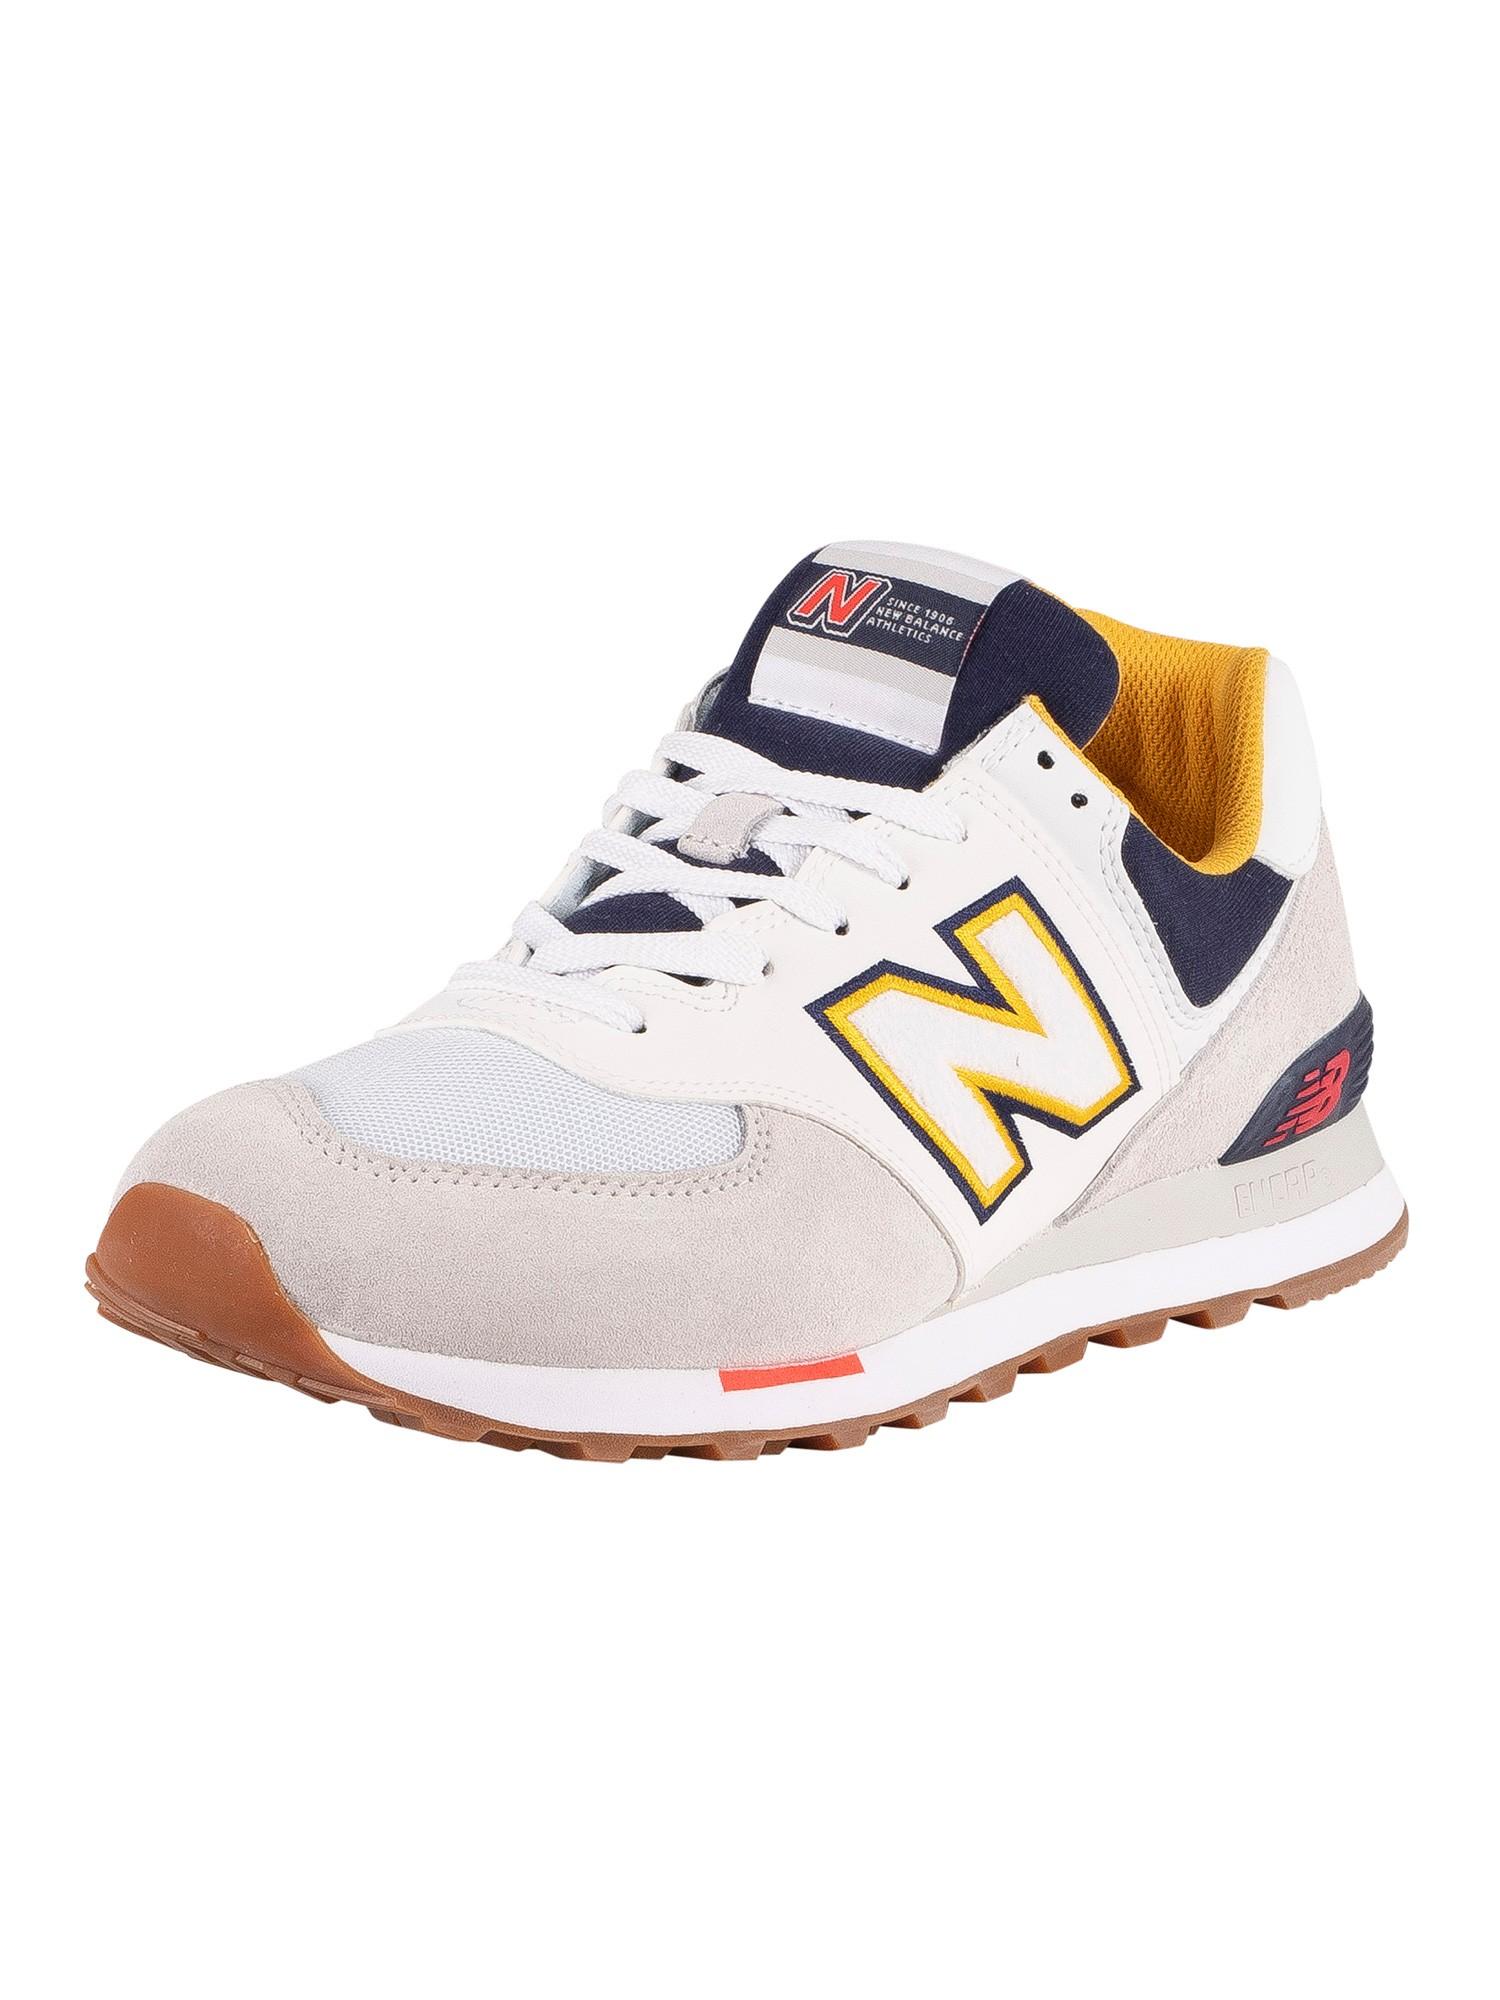 new balance 574 uomo pelle bianca